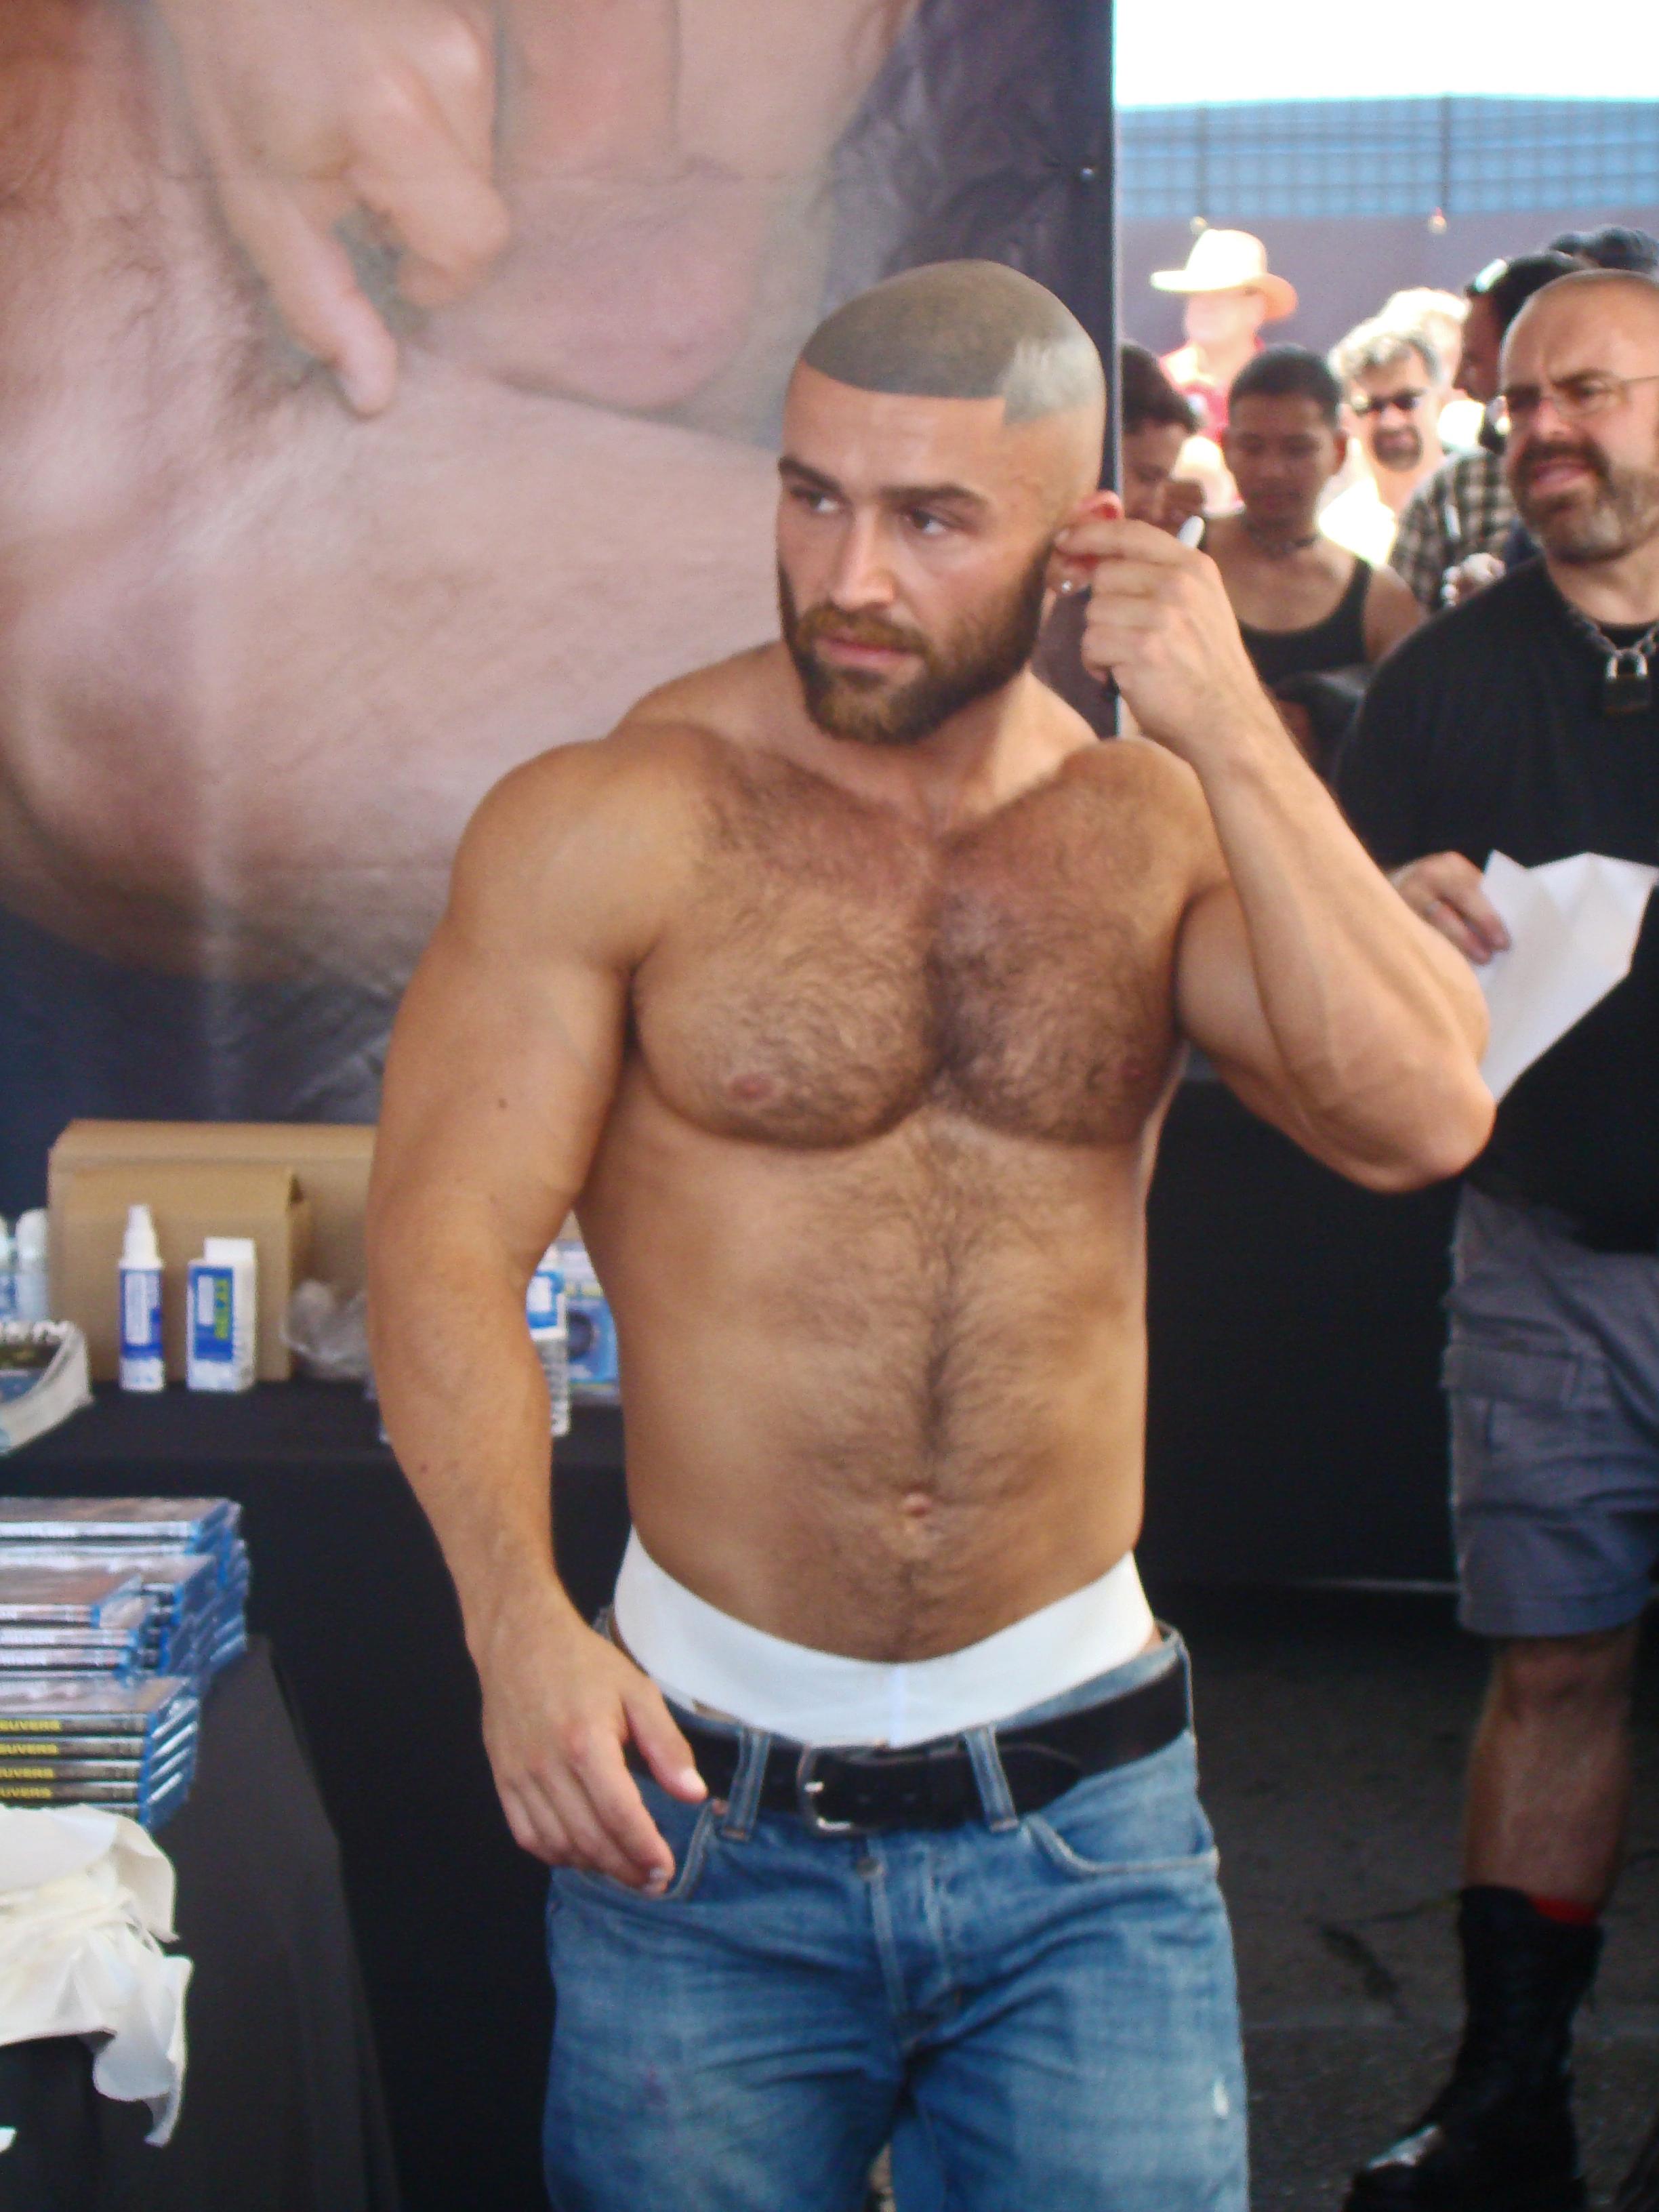 Actores Porno Gay Tatuajes françois sagat - wikipedia